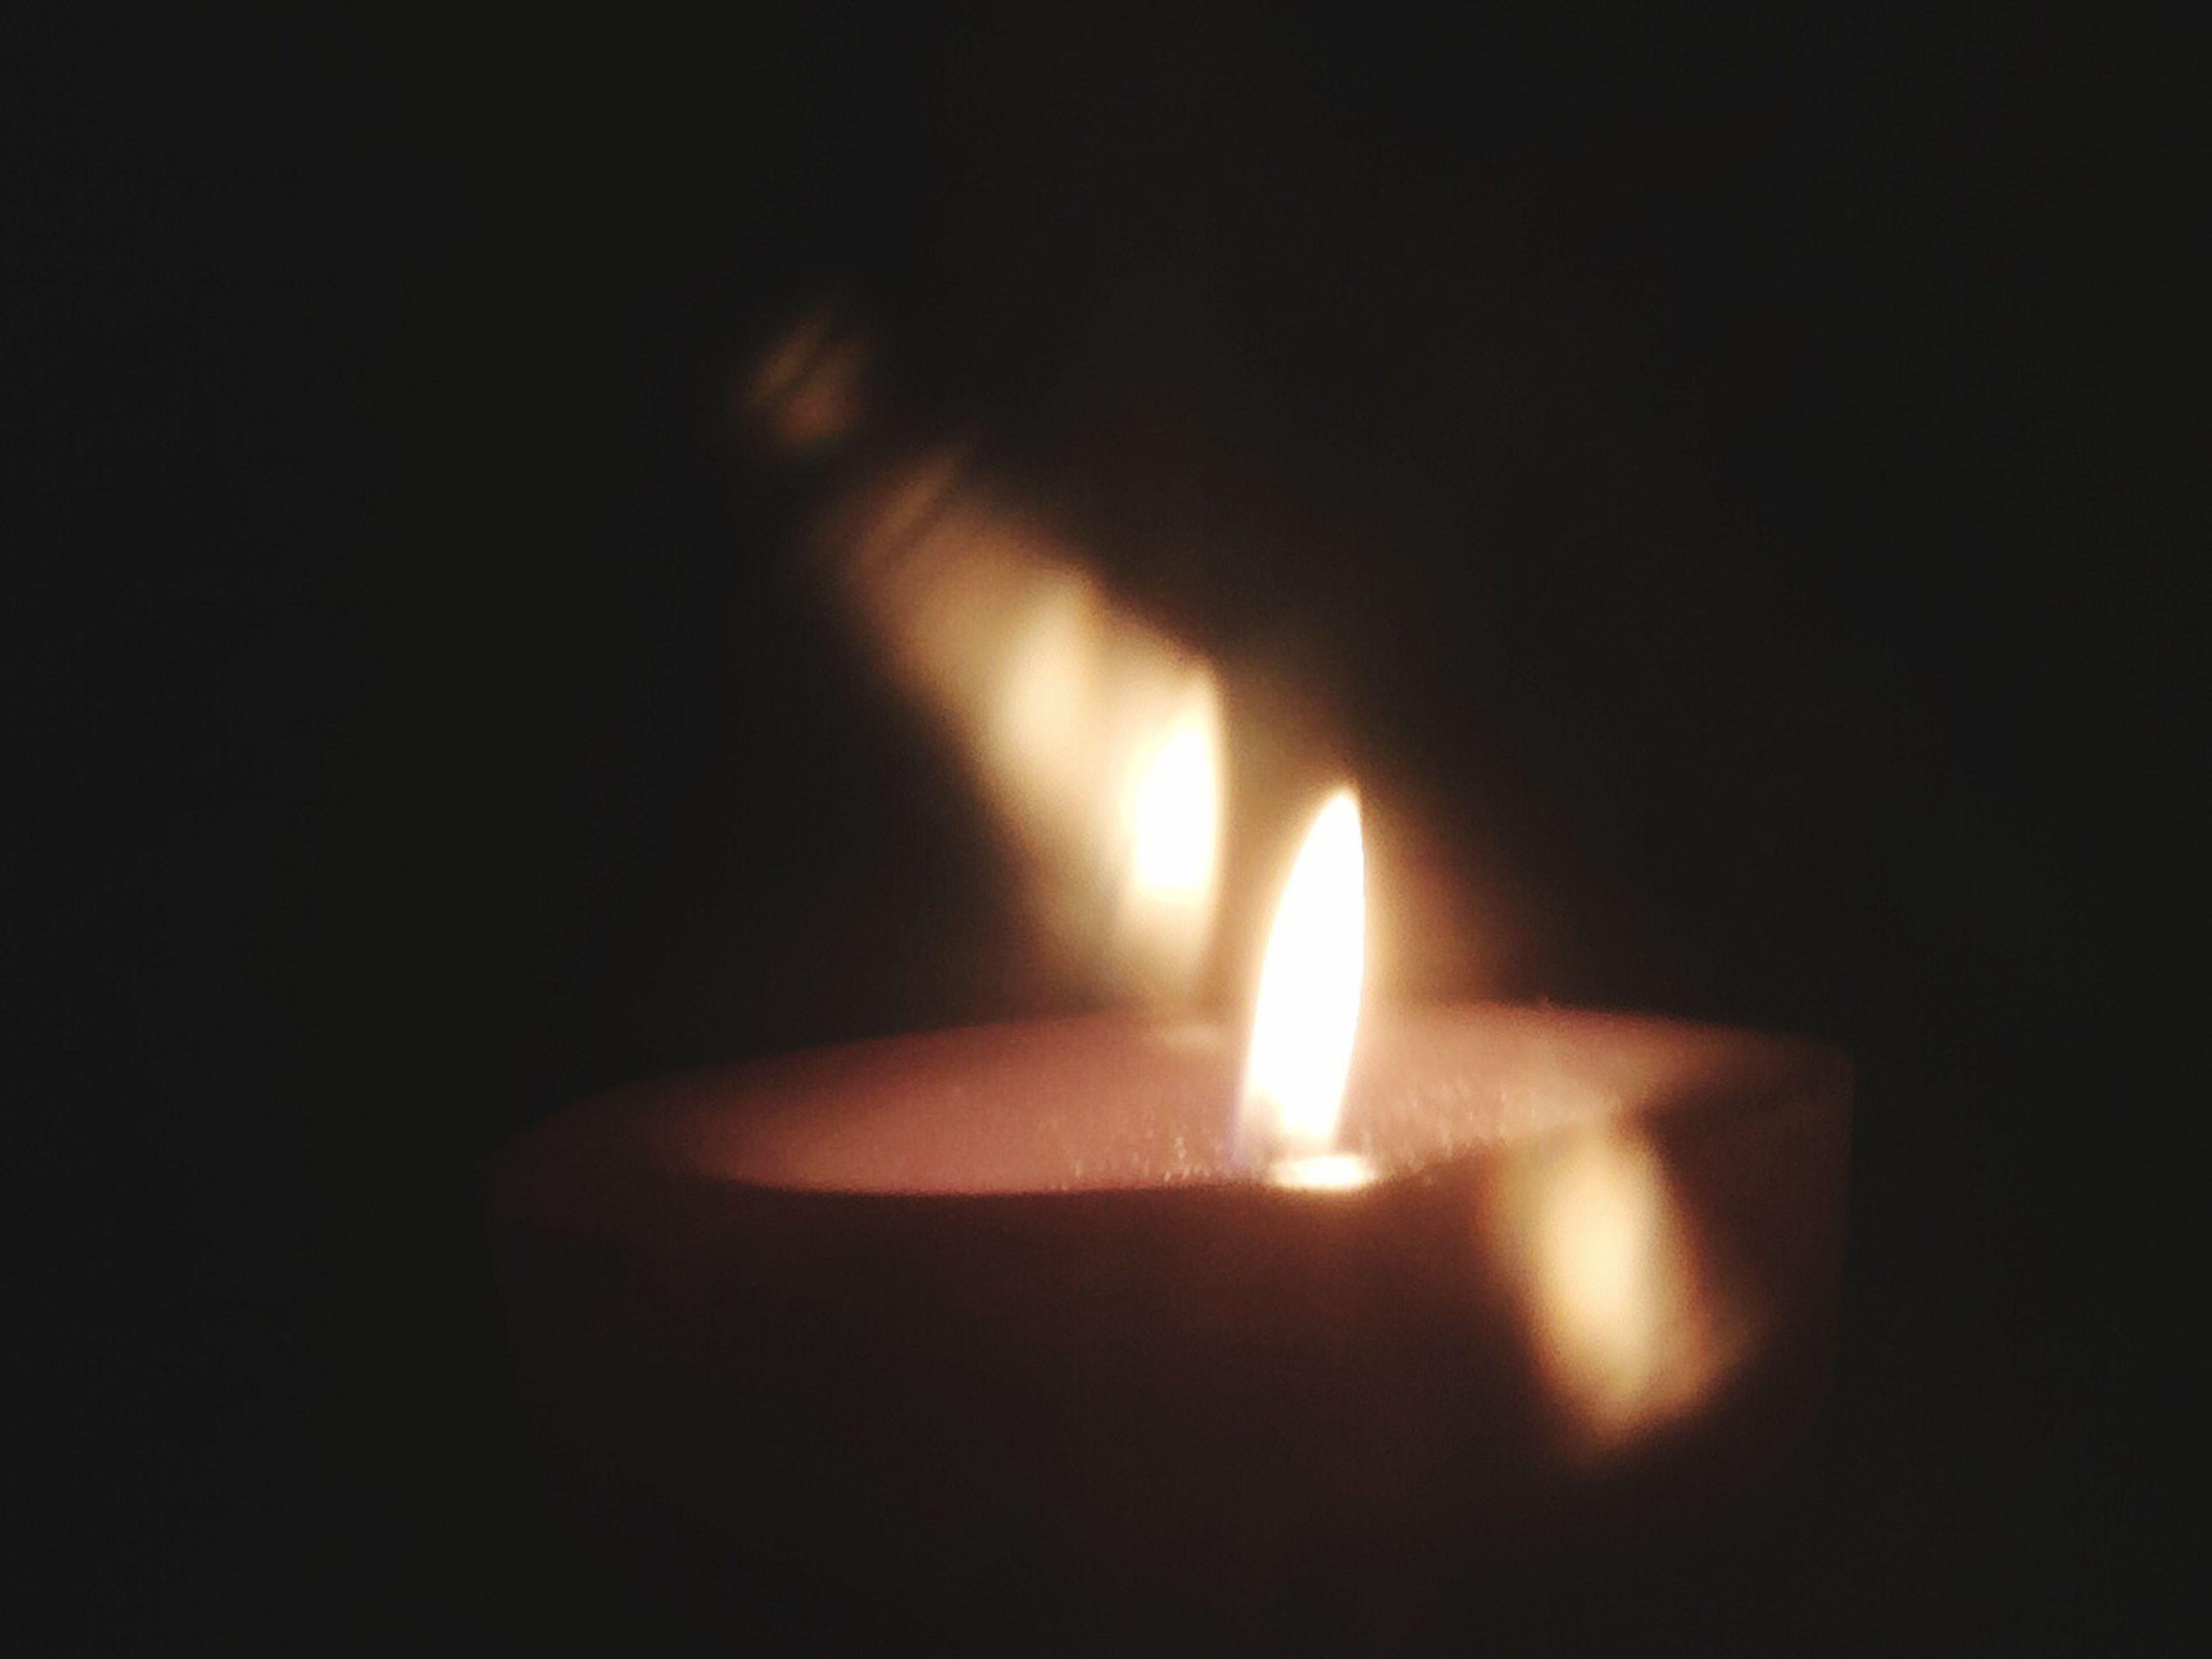 flame, burning, heat - temperature, glowing, fire - natural phenomenon, illuminated, dark, copy space, darkroom, candle, lit, indoors, night, black background, close-up, studio shot, fire, light - natural phenomenon, lighting equipment, candlelight